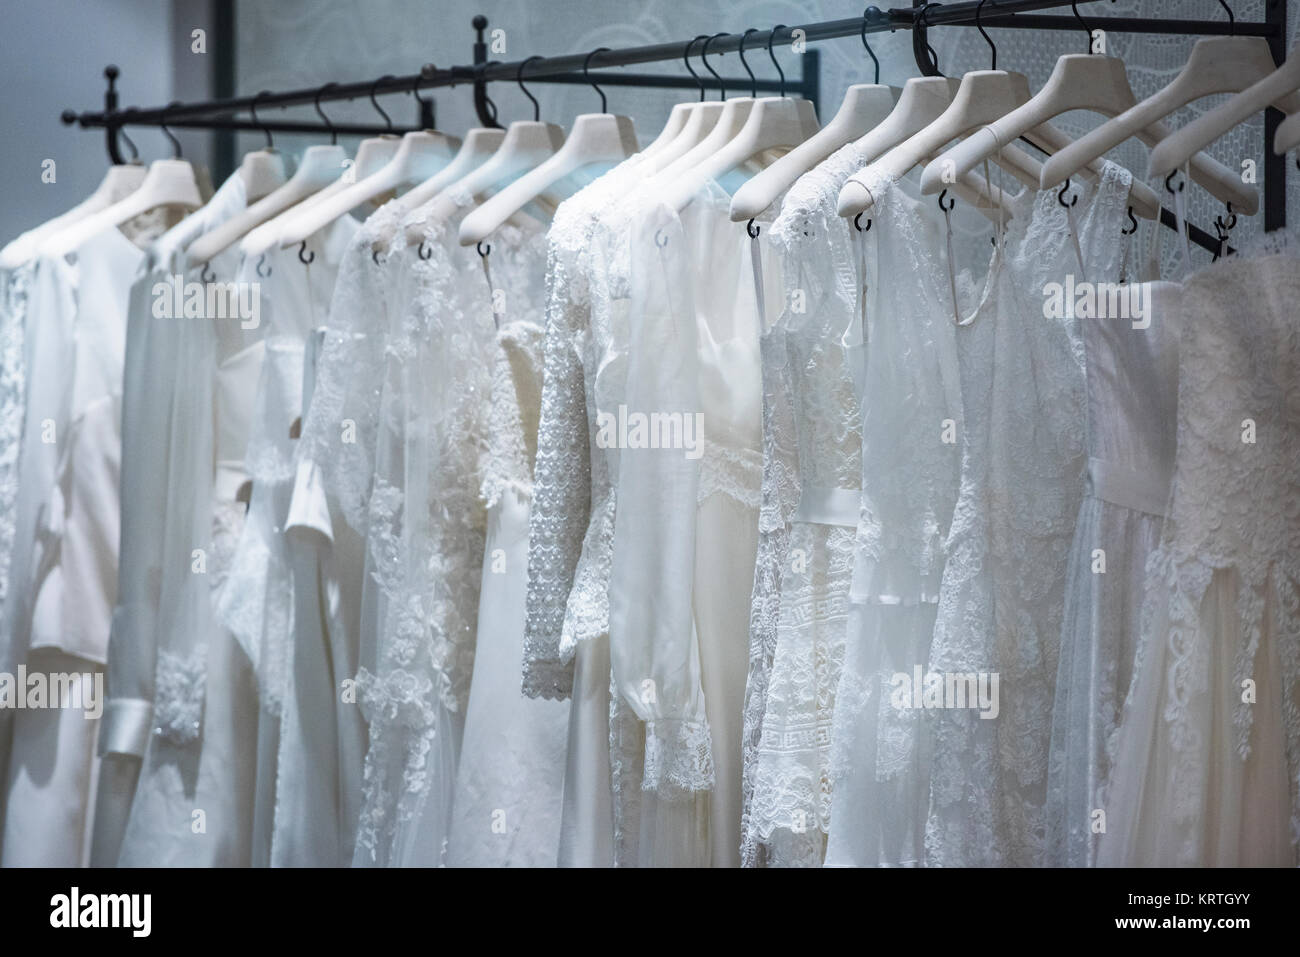 Bride Clothes Shop Wedding Dresses Stock Photos & Bride Clothes Shop ...